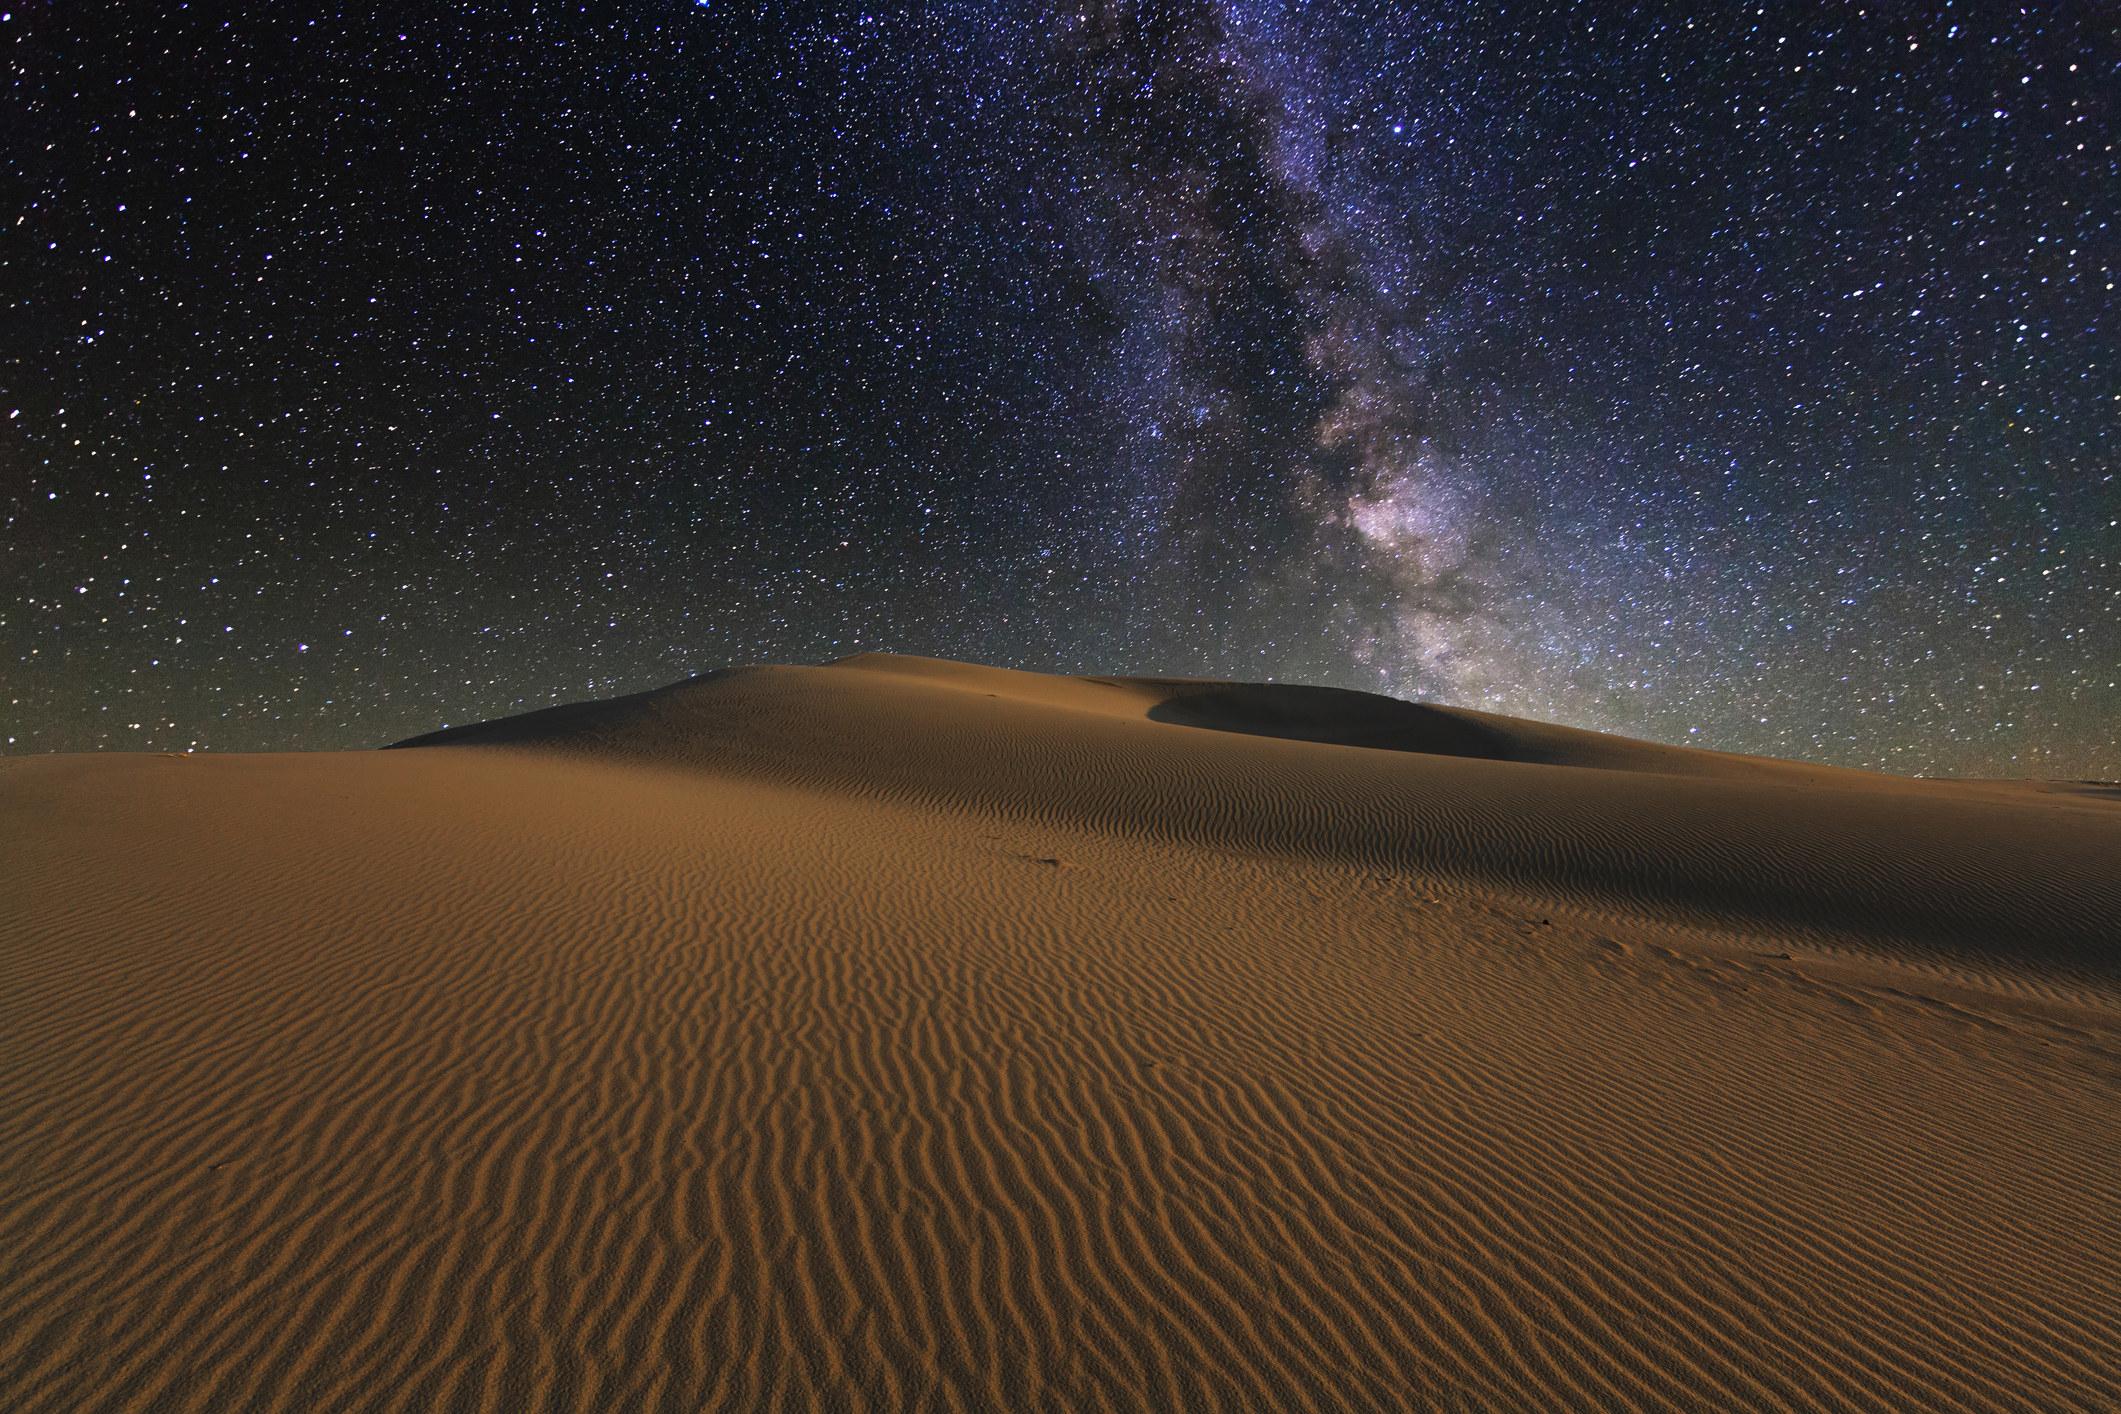 Starry night sky above open wind-swept desert